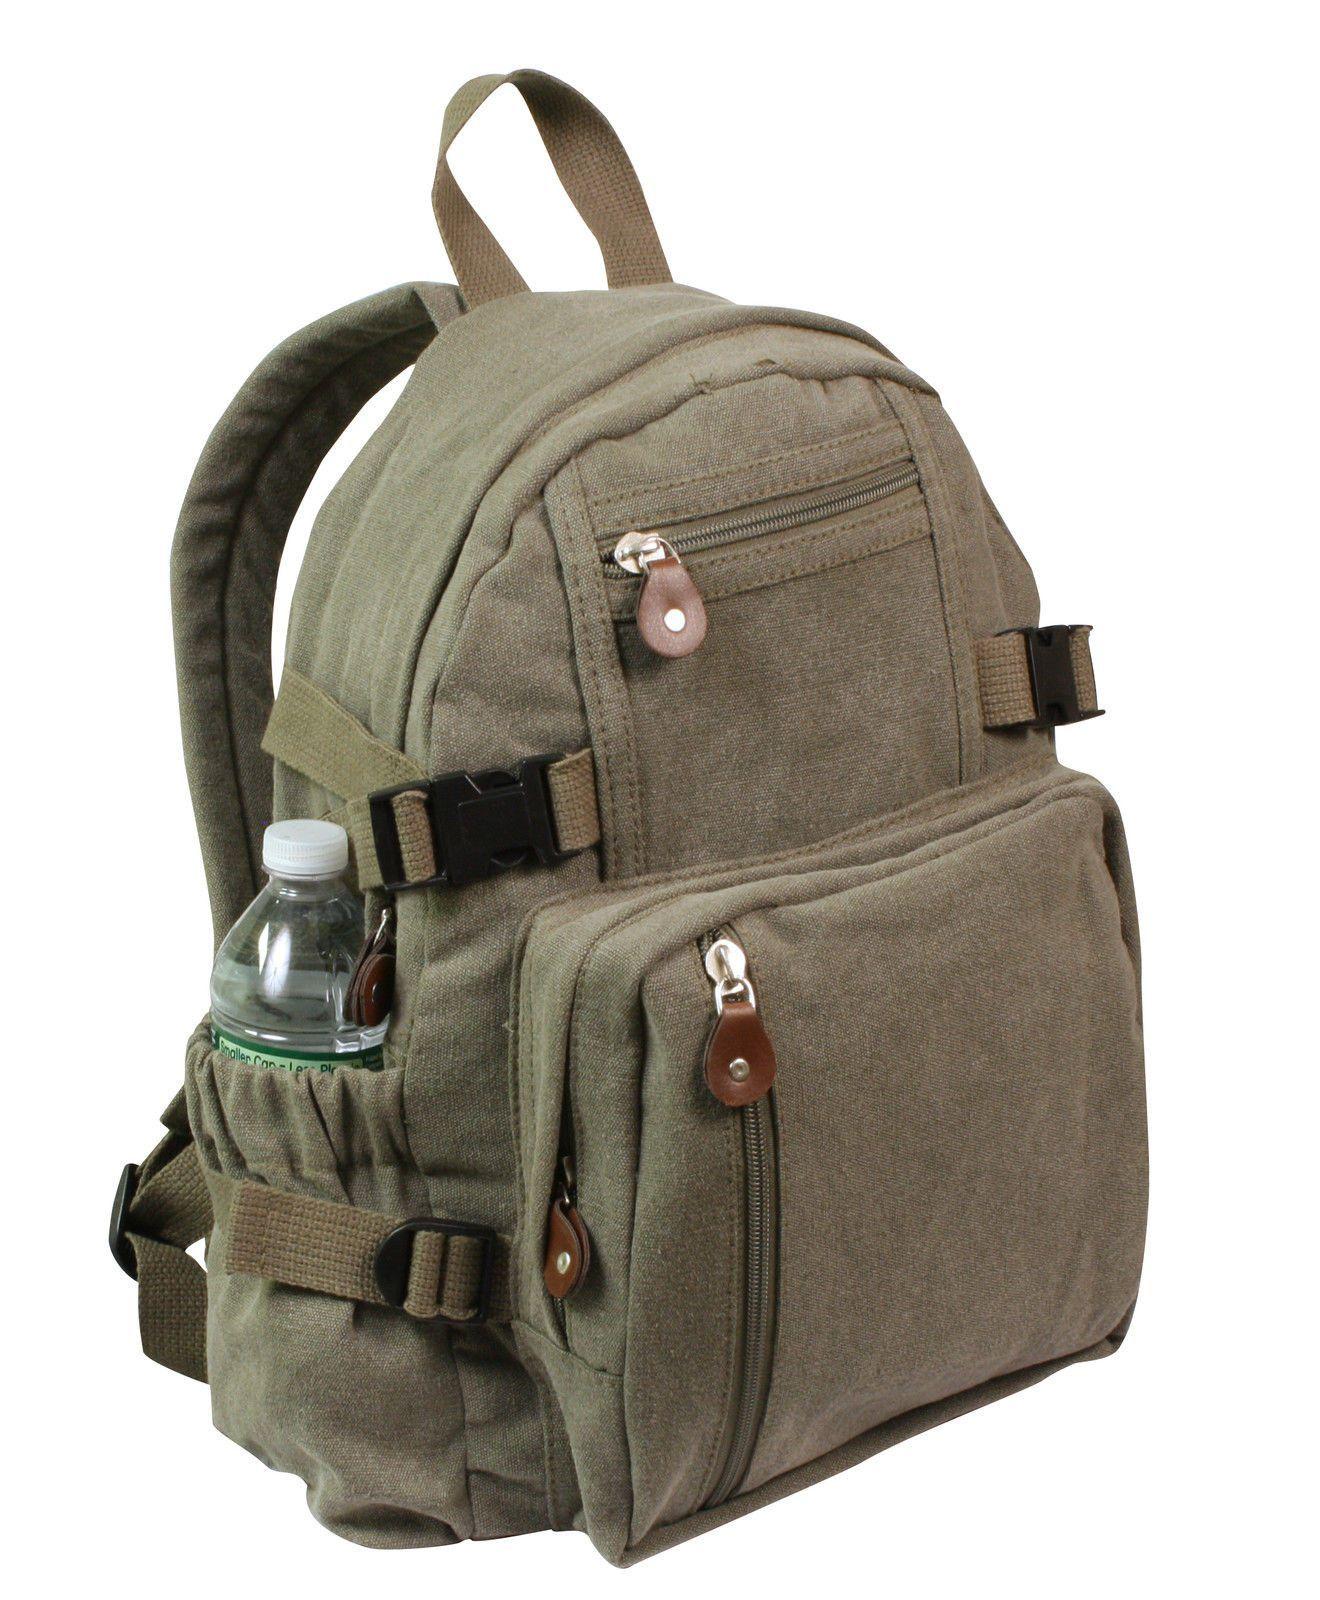 63866c0adc3e Vintage Compact Backpack - Rucksack - OD